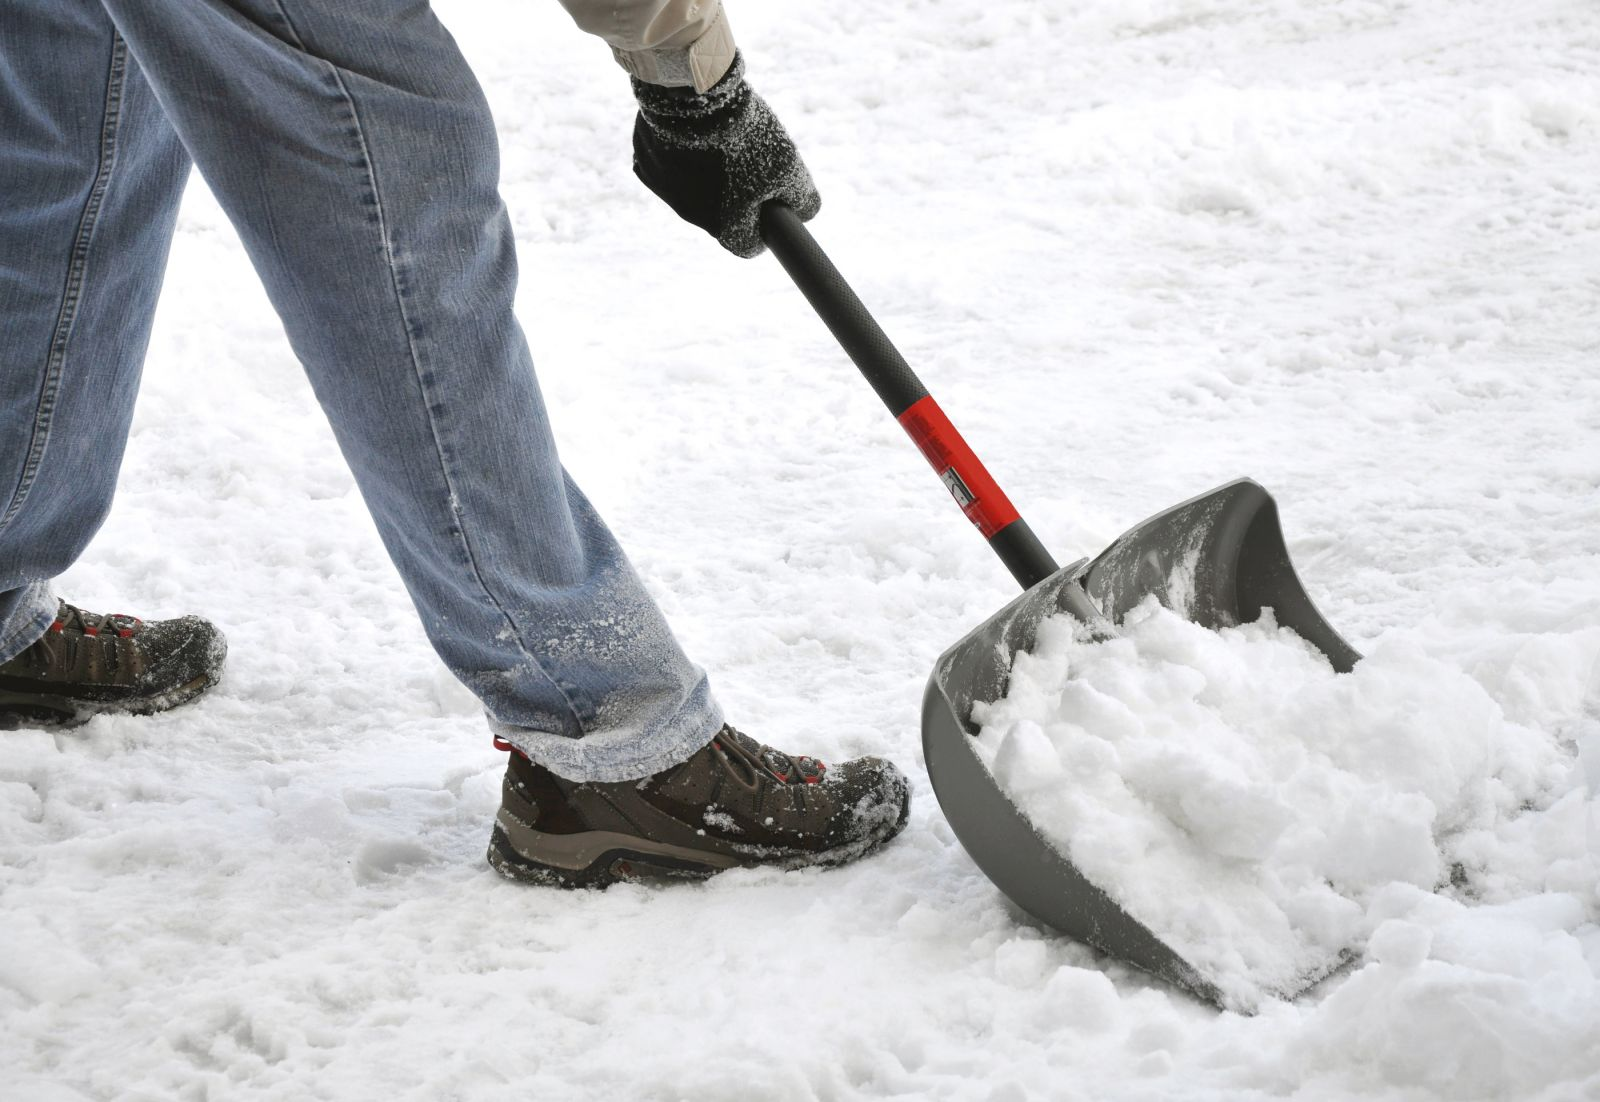 shoveling snow winter heart attacks